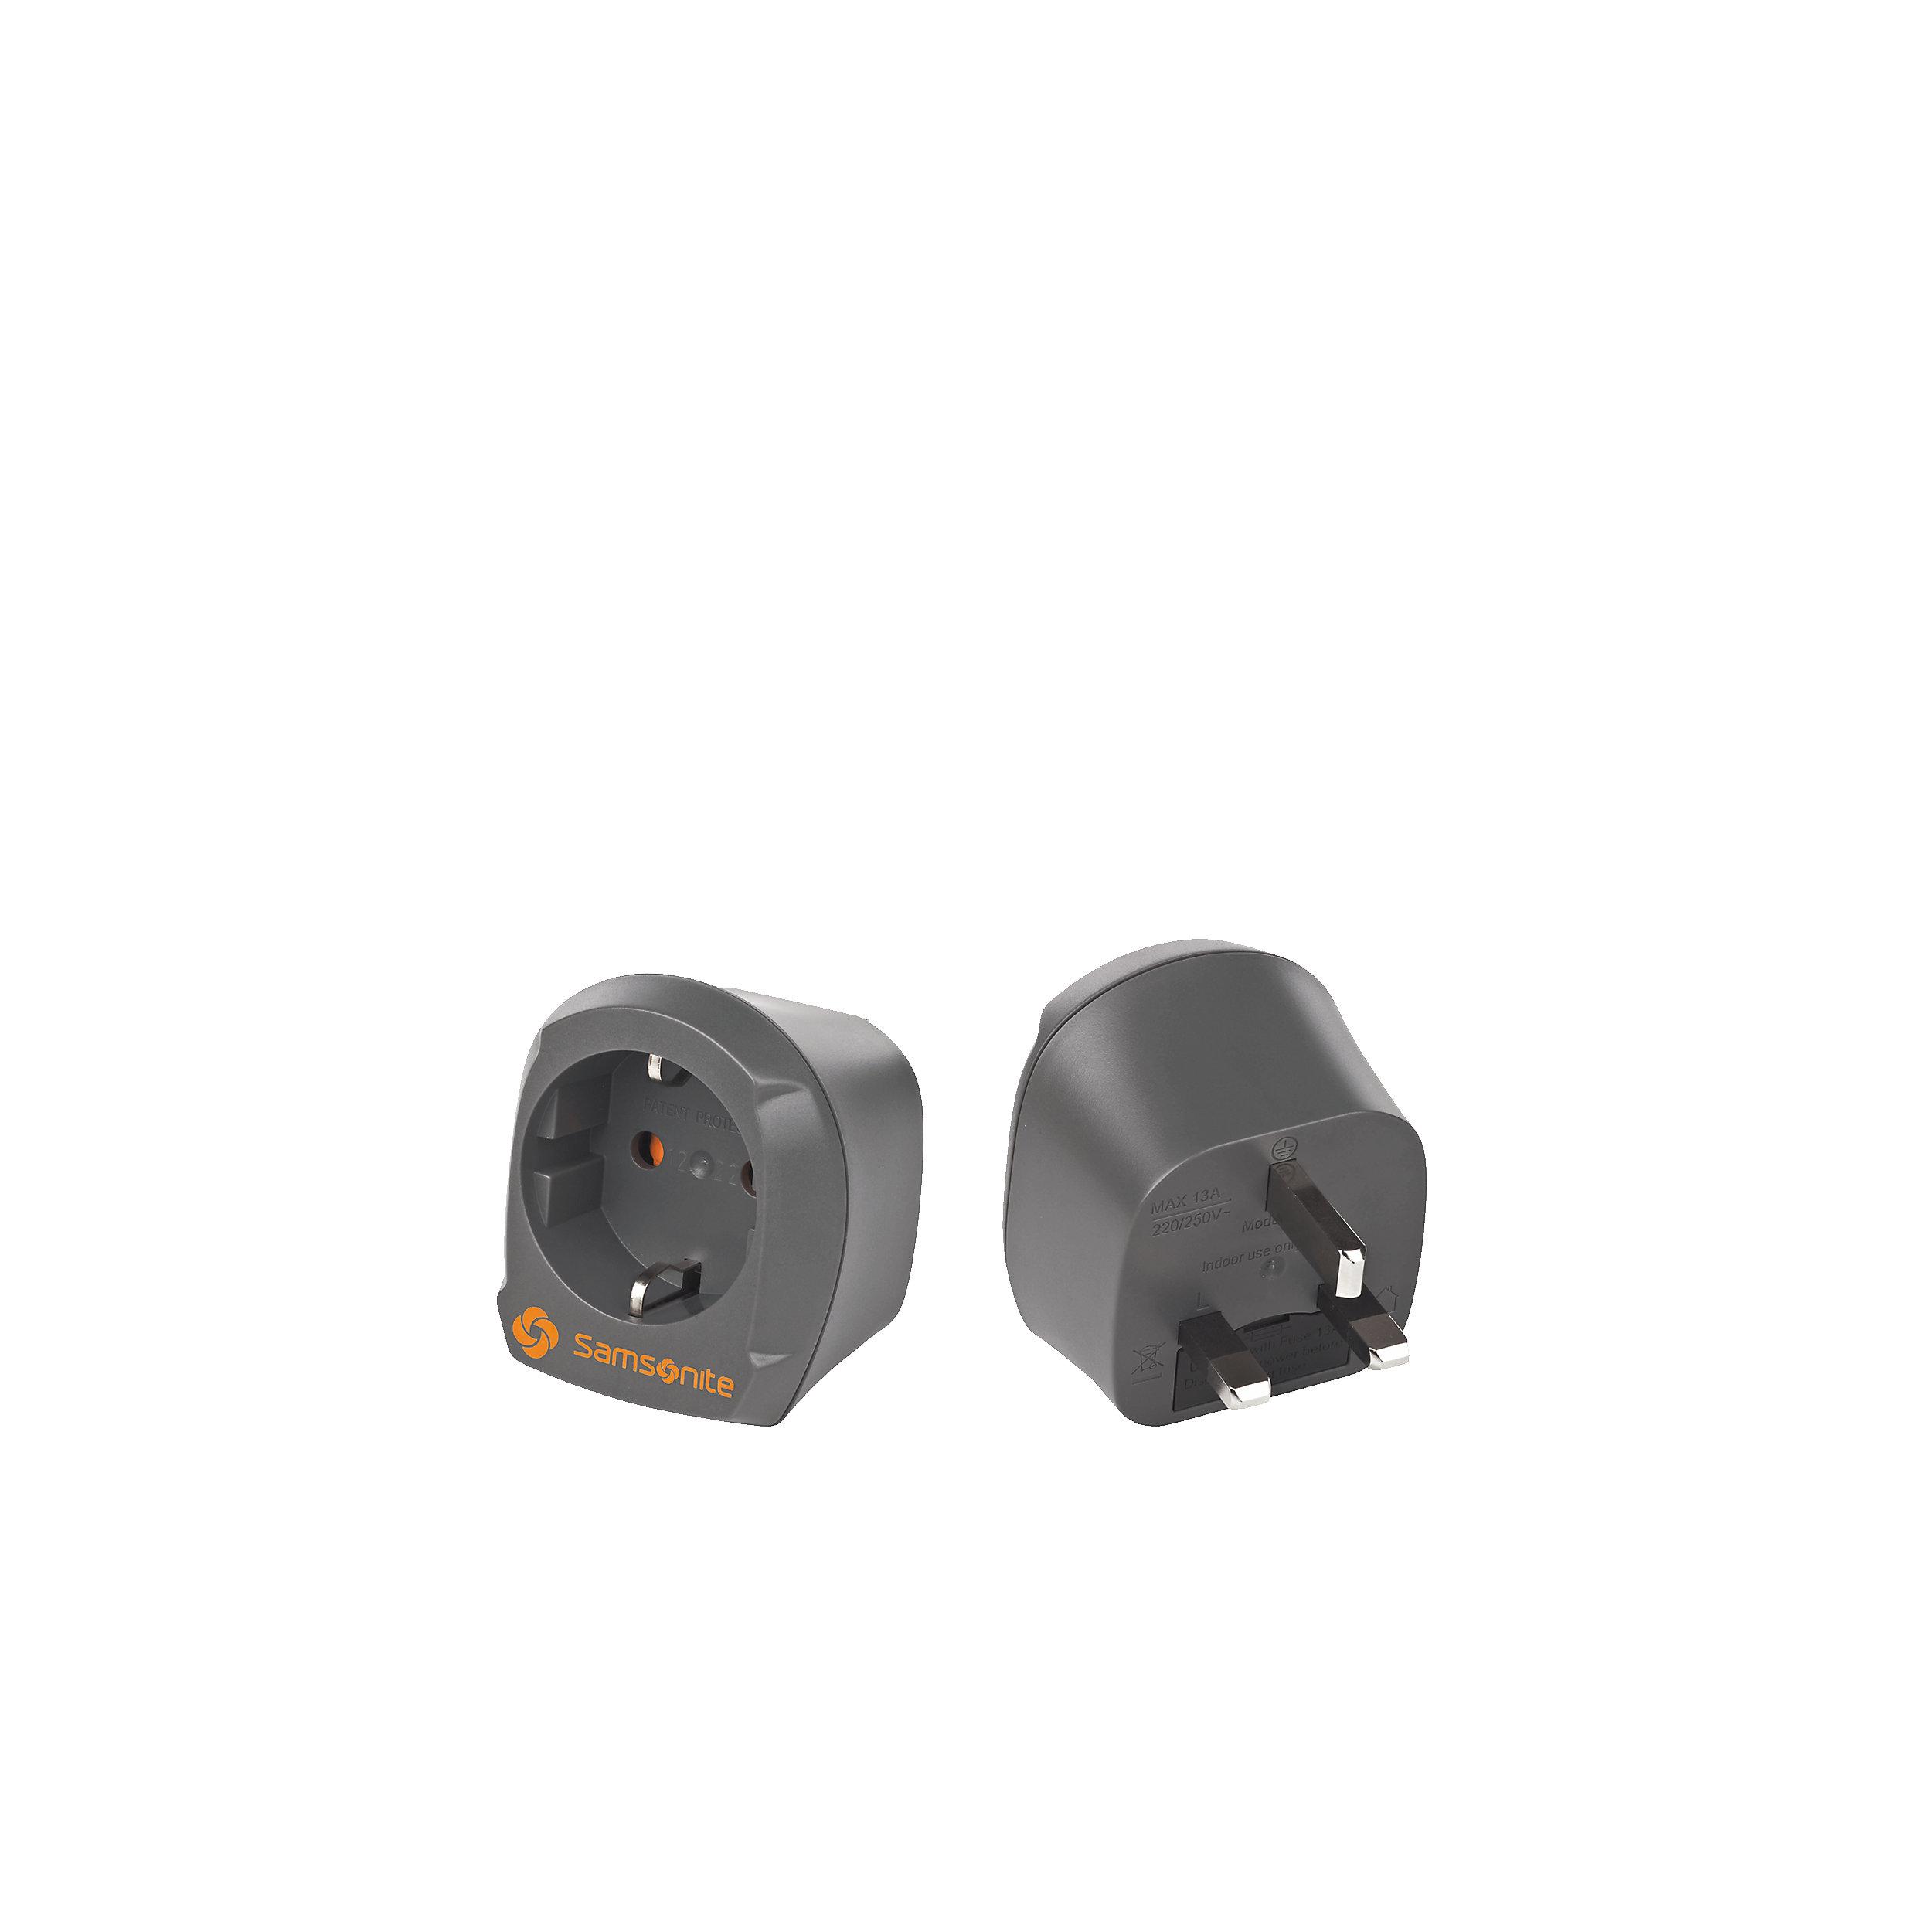 Adapter Europa/UK 2 Electronics Accessories